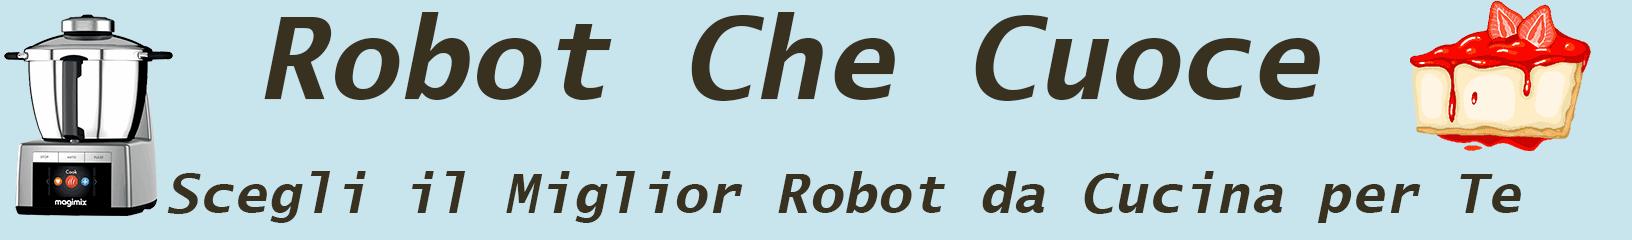 robotchecuoce